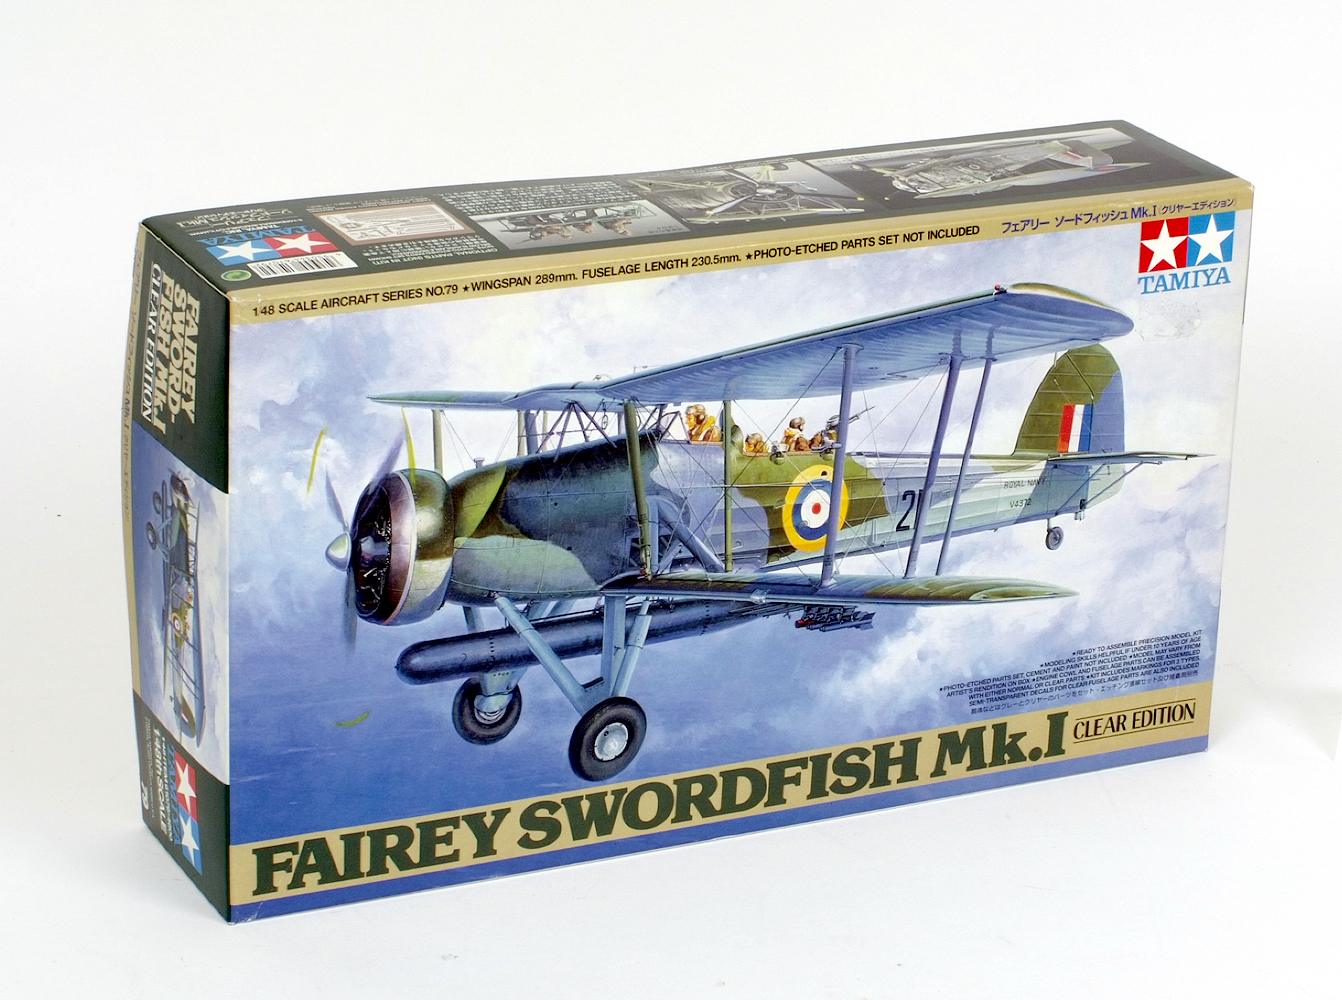 Lot 23 - Tamiya 61079*4600 Fairey Swordfish Mk.1 Clear Edition plastic model kit.